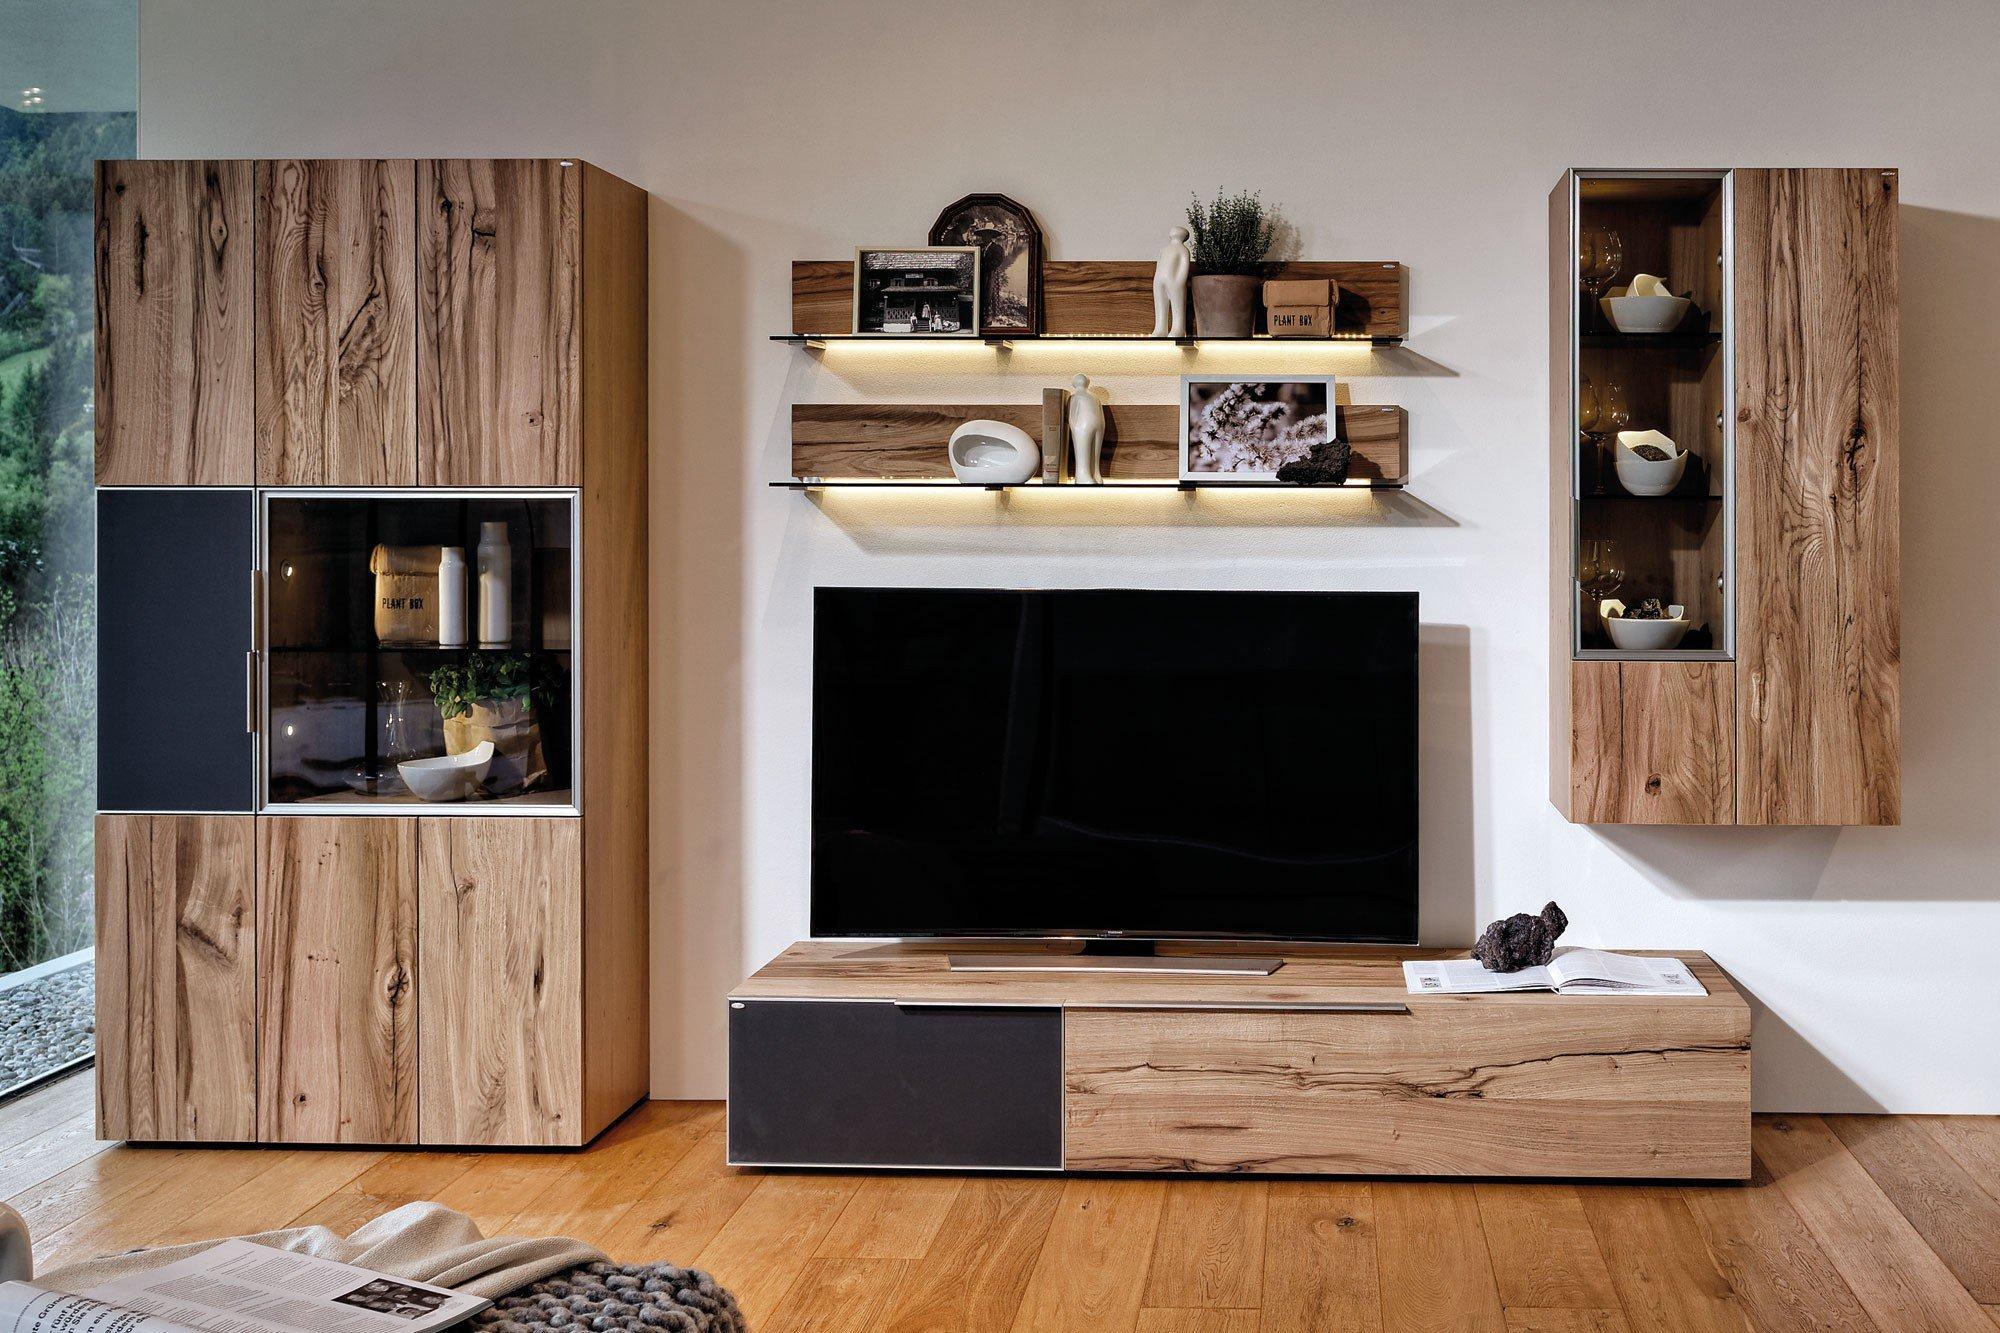 wohnwand anthrazit interesting trendteam flo wohnwand anbauwand hochglanz wei absetzungen. Black Bedroom Furniture Sets. Home Design Ideas